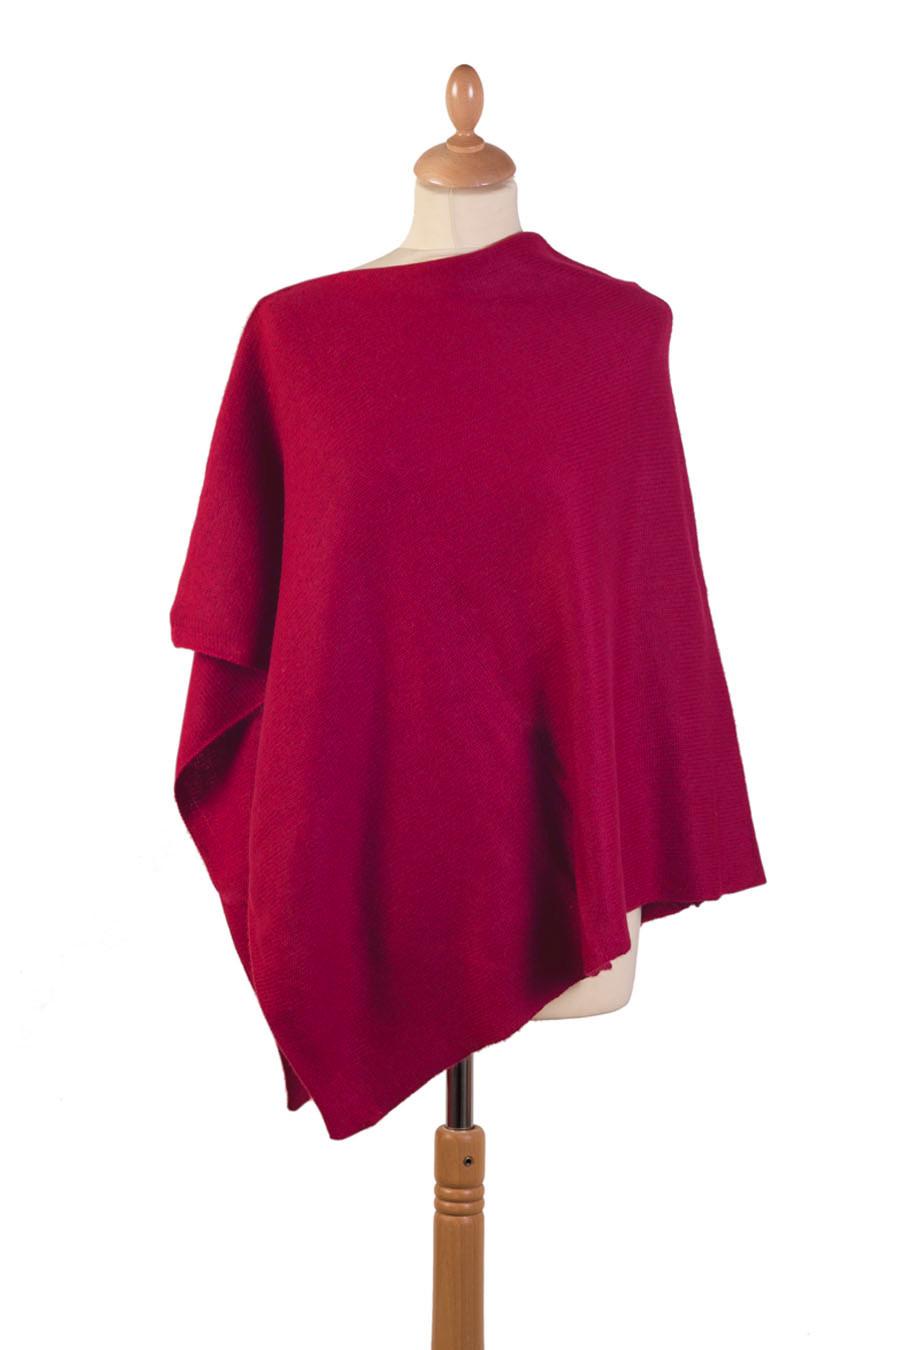 Poncho 4 fils cachemire MIZAR Rouge rubis